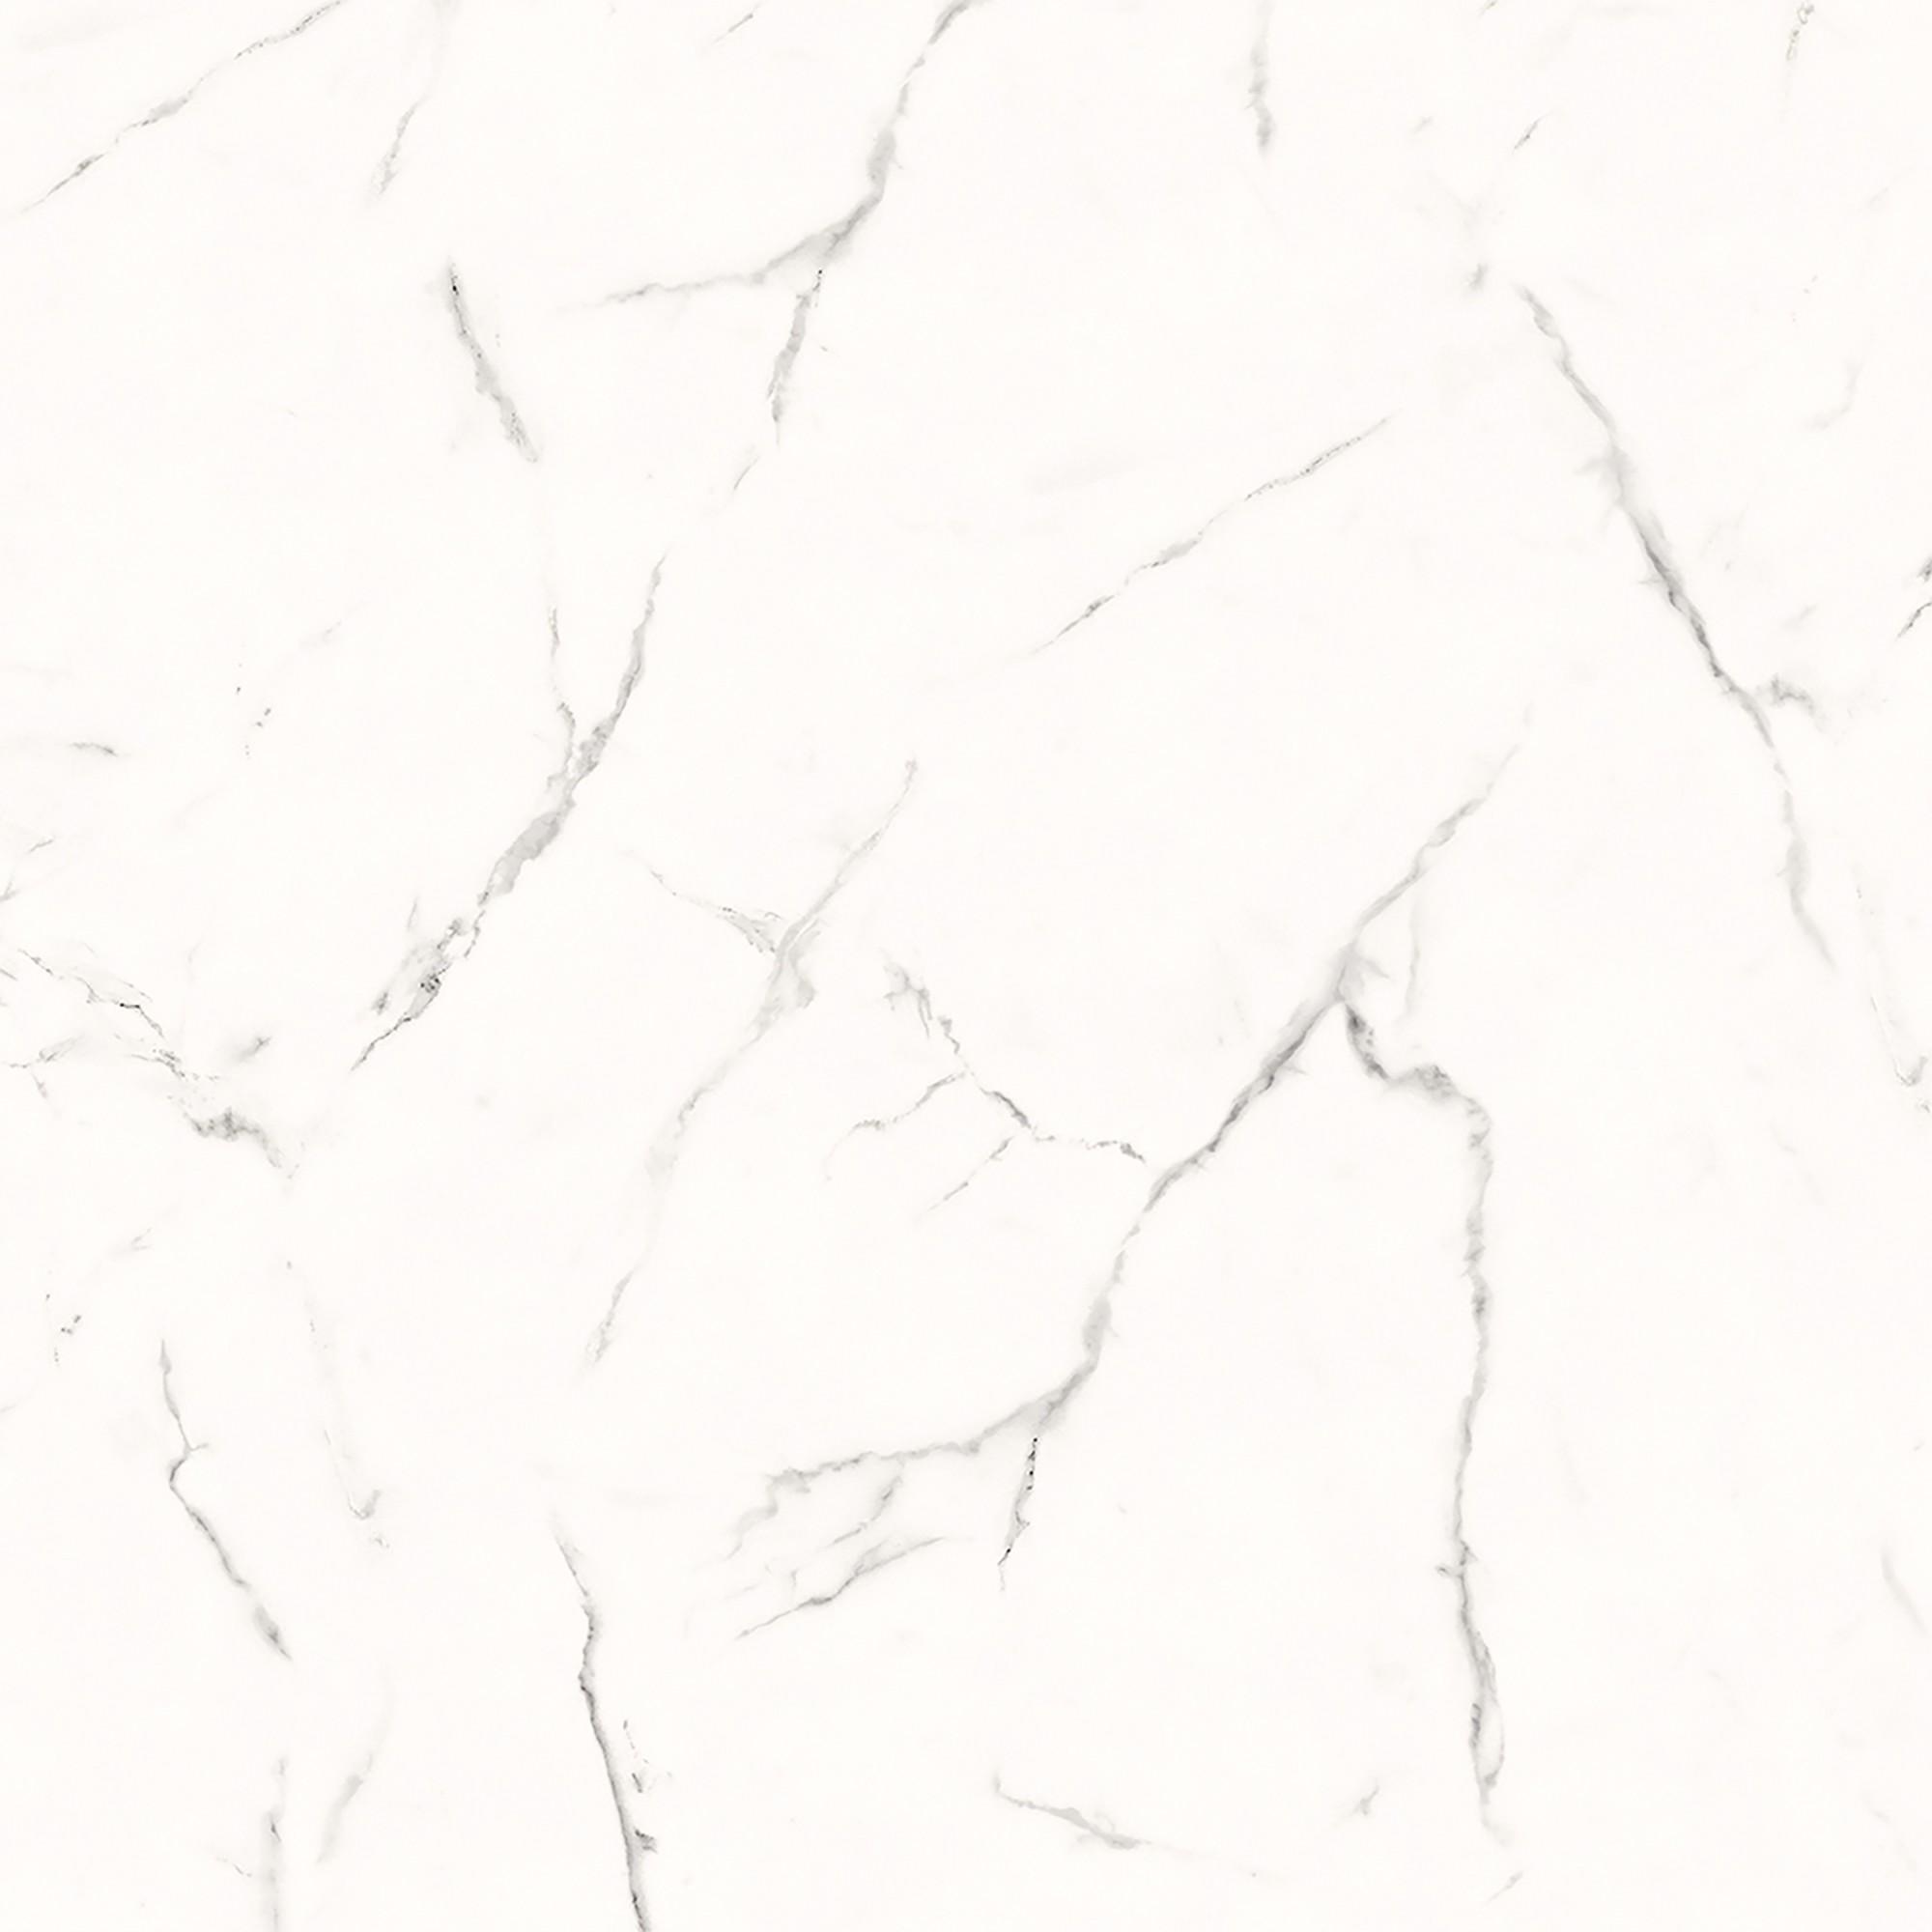 Ceramica Tipo A 62x62 cm Piazza Plus Acetinado - Carmelo Fior